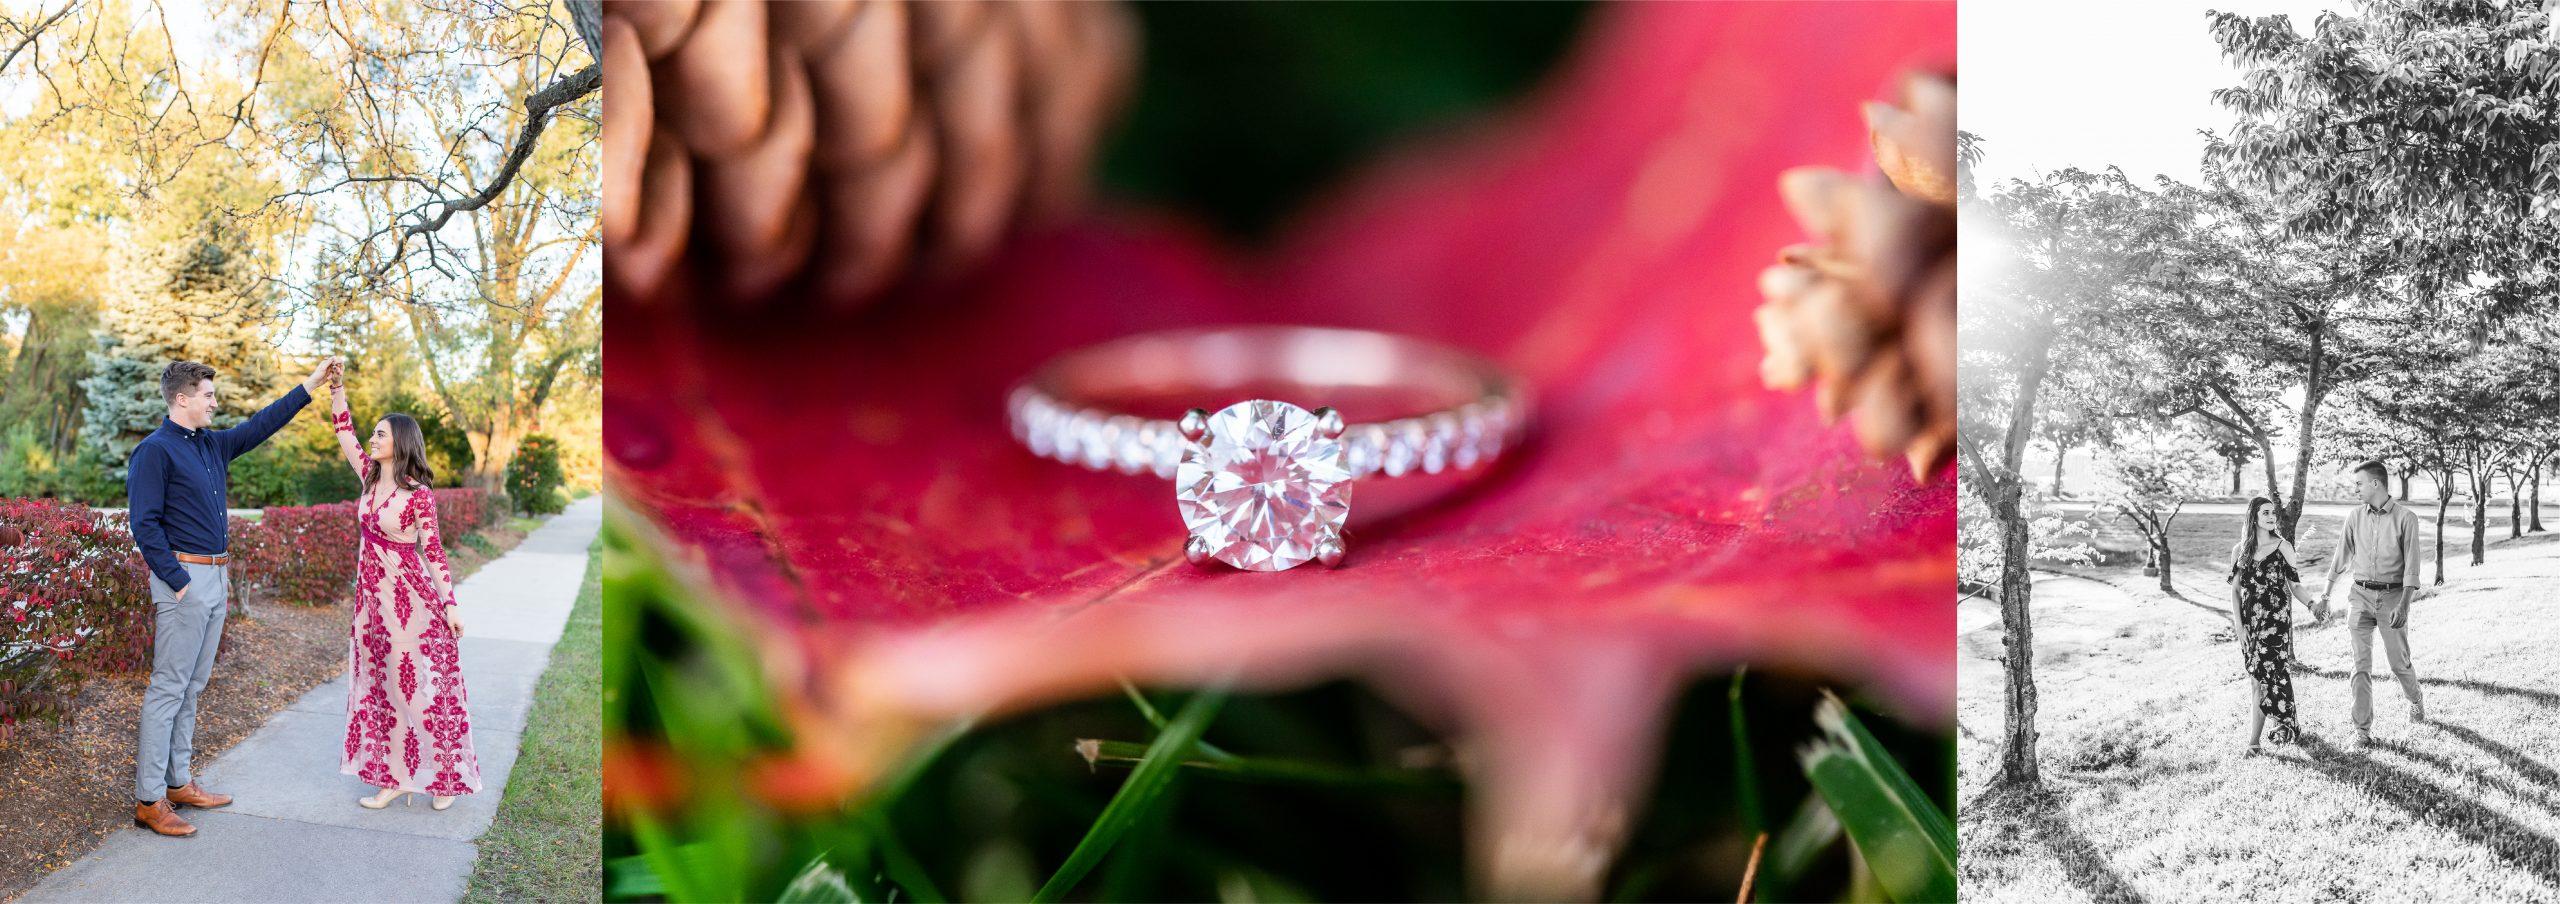 kandra-lynn-photography-wedding-photographer-17